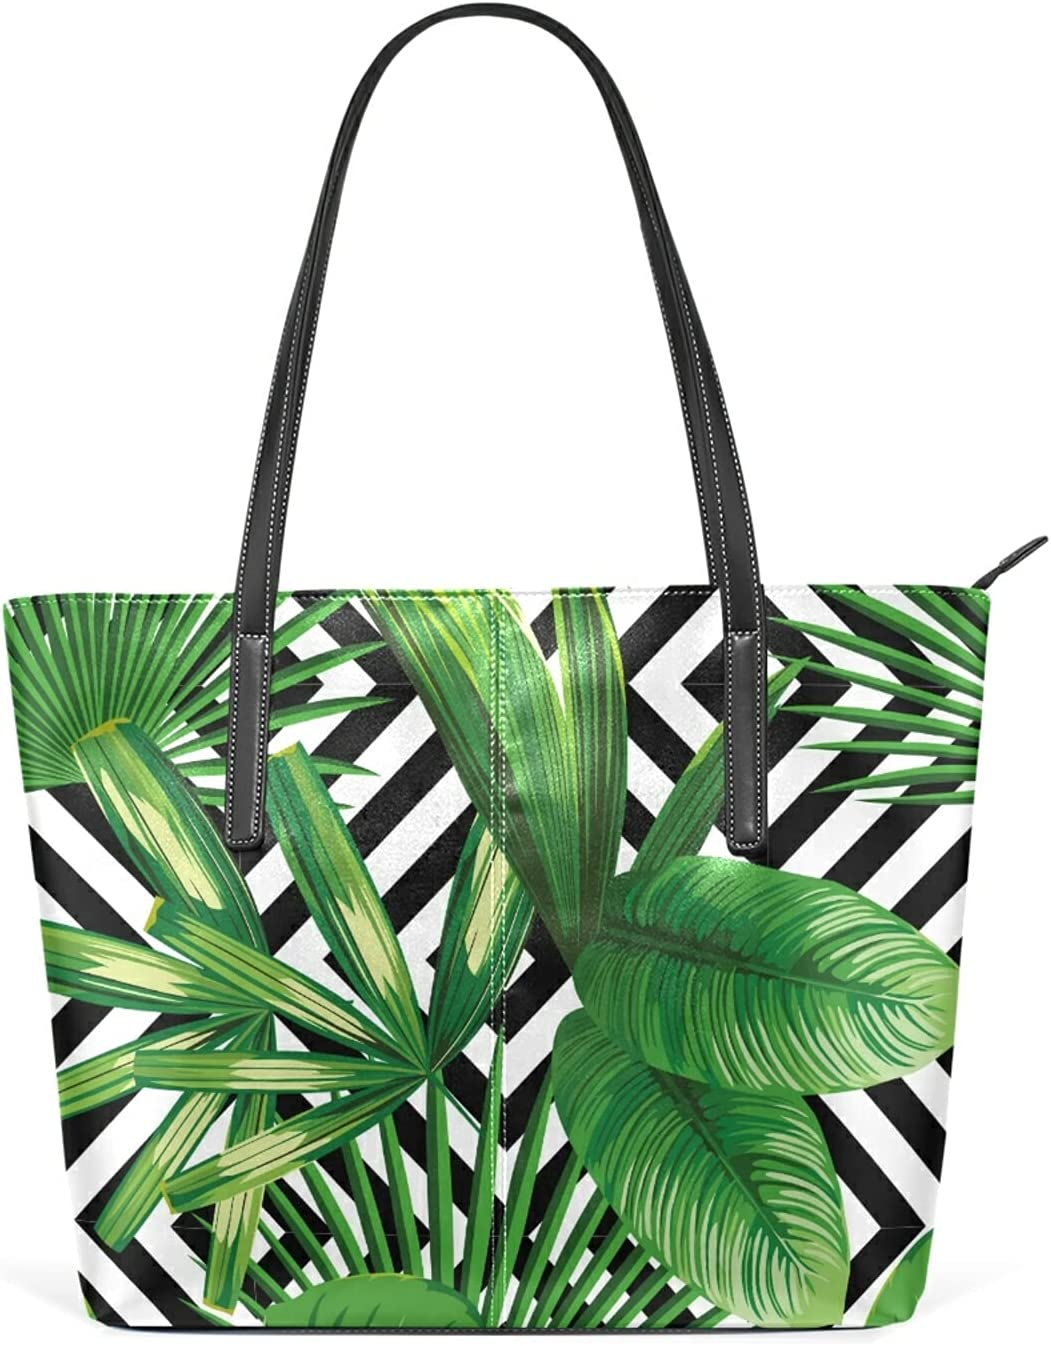 gift Palm Leaves Jungle Plant Handbags Rare Crossbod Leather Shoulder Bags